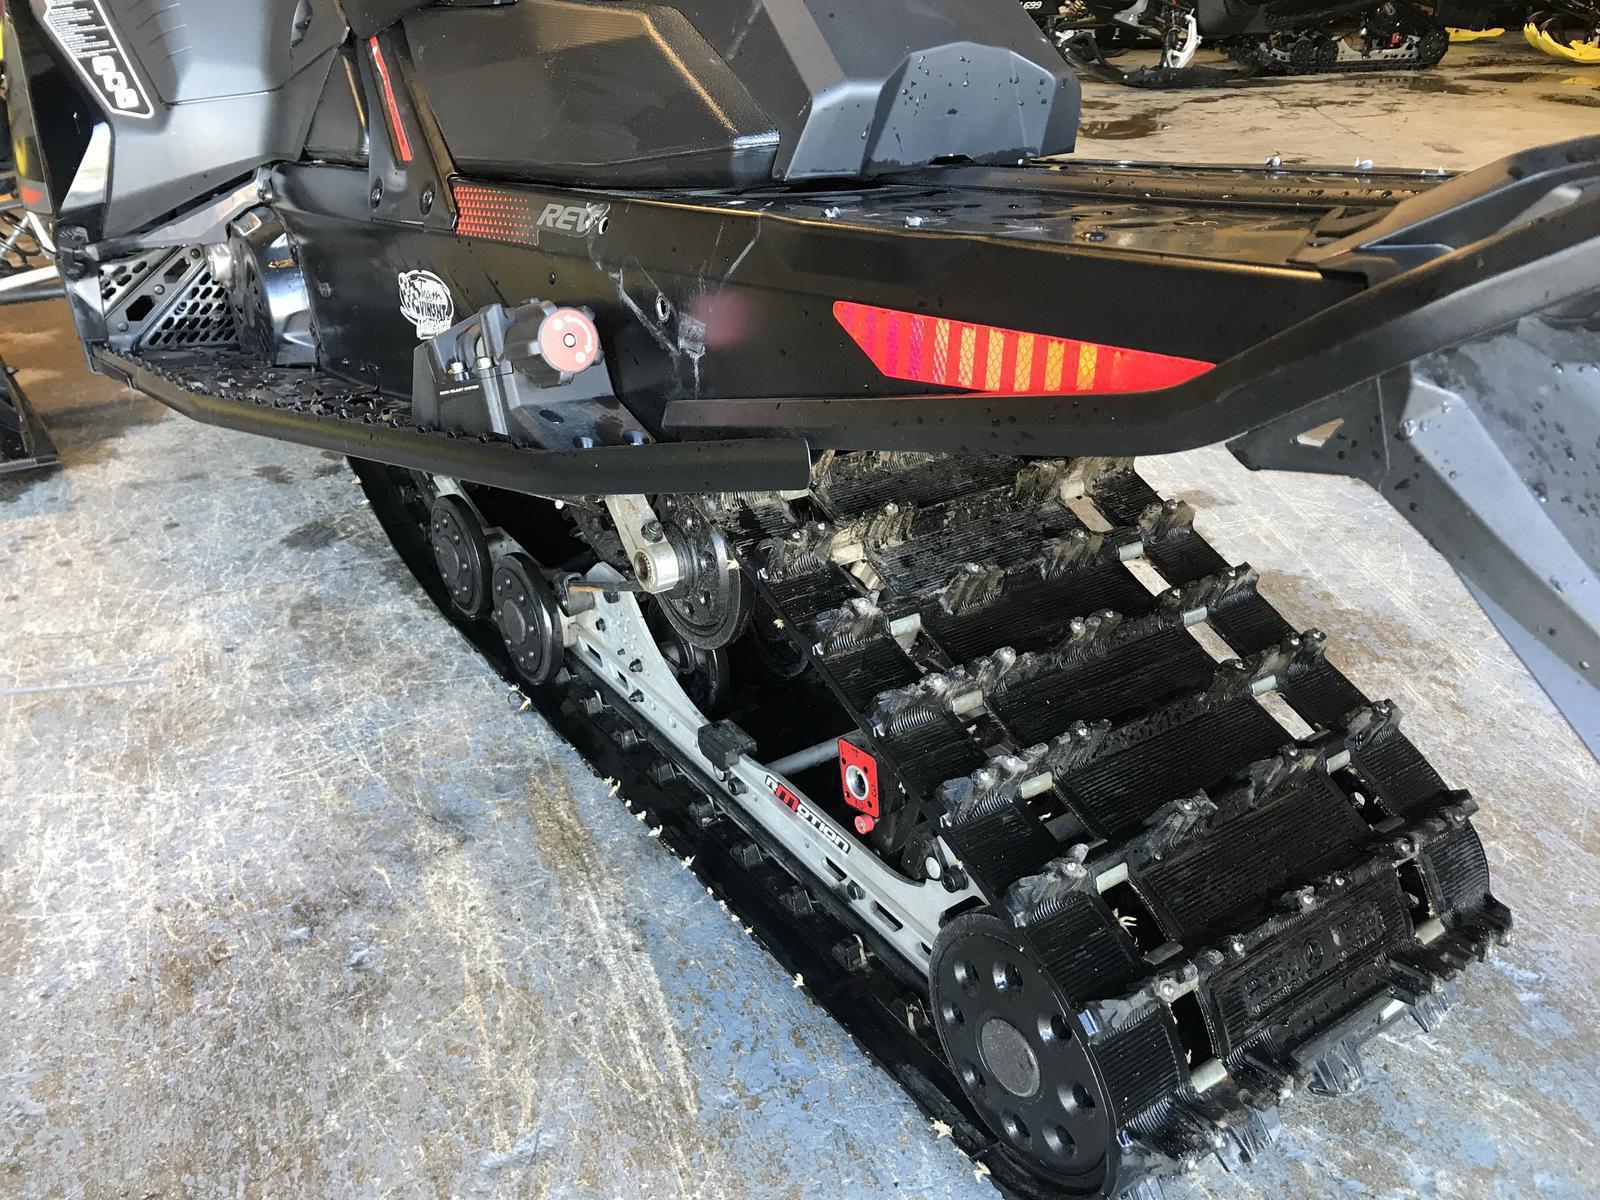 2017 Ski Doo MX Z X-PACKAGE 850 E-TEC w/ QAS   2 of 3